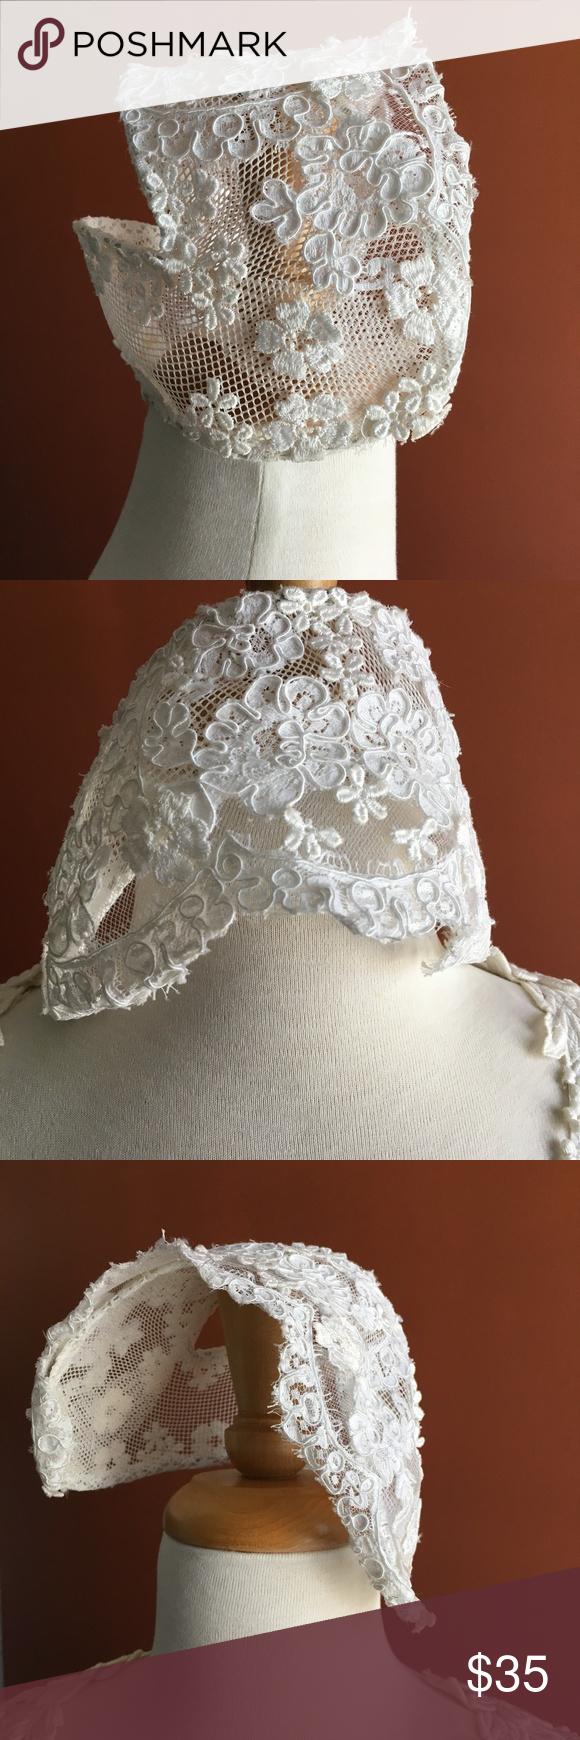 Priscilla of boston wedding dress  VINTAGE PRISCILLA OF BOSTON Veil Headpiece Bridal